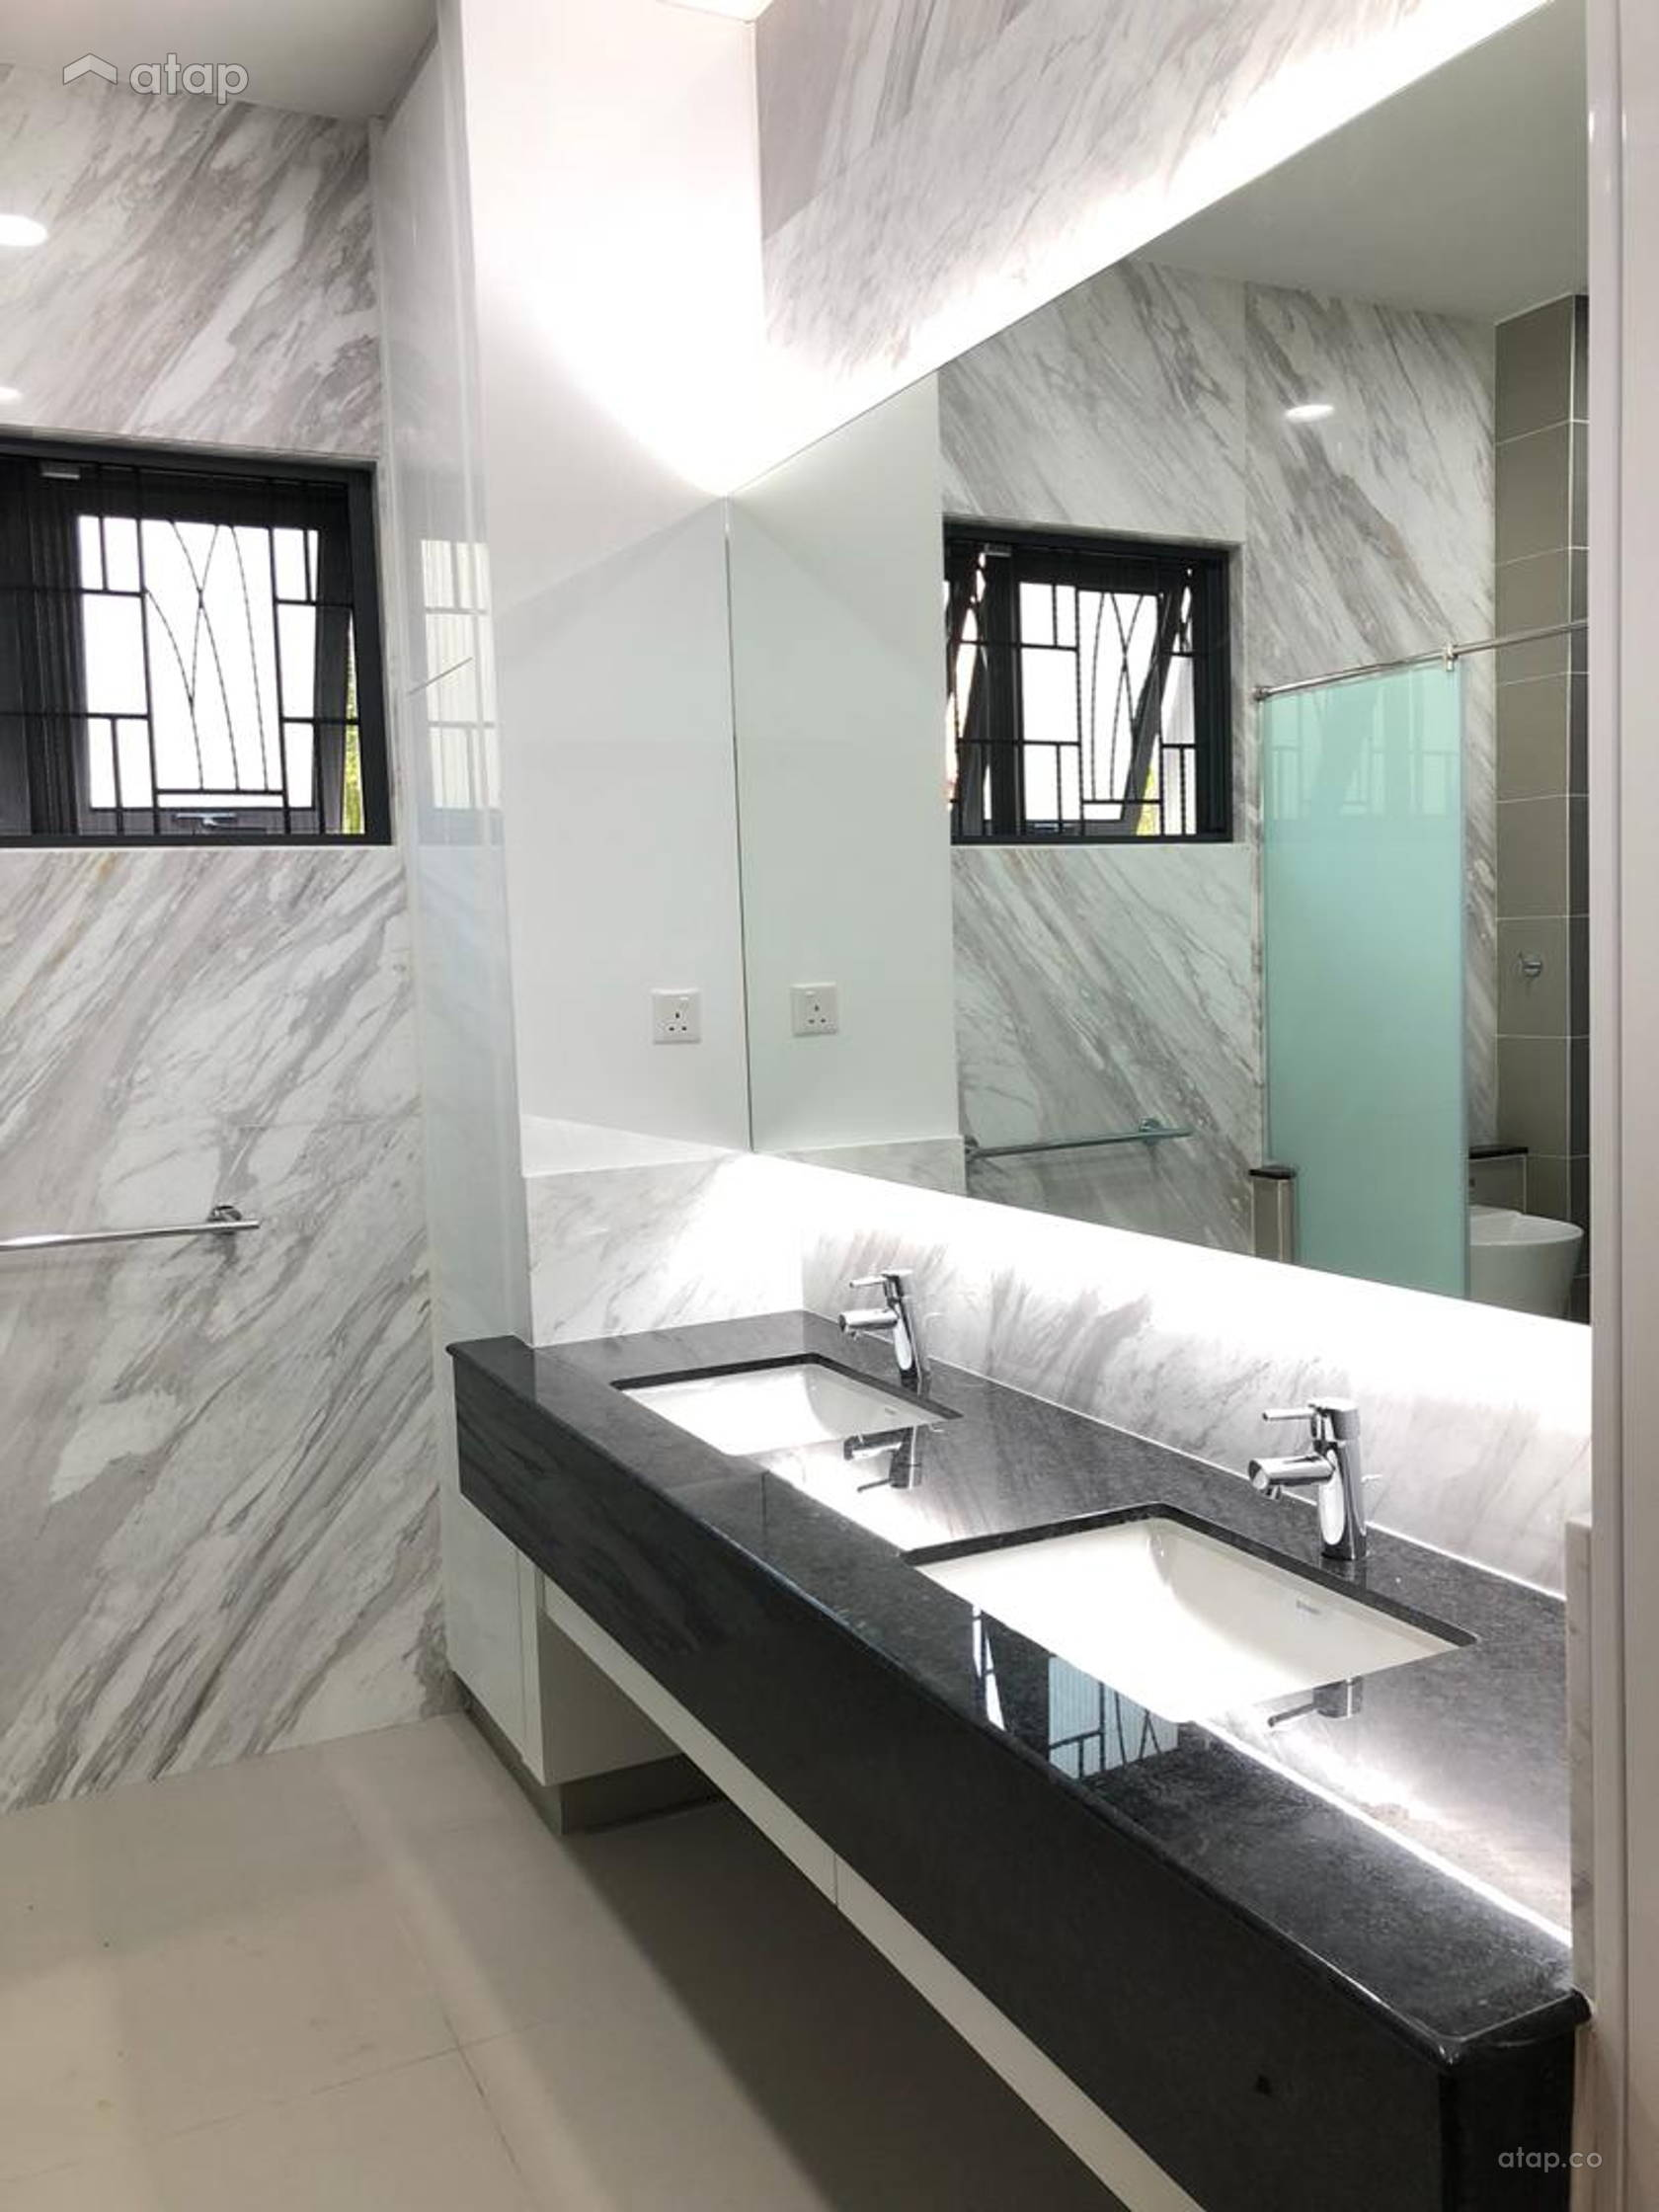 Classic Modern Bathroom Bungalow Design Ideas Photos Malaysia Atap Co,Types Of House Interior Designs